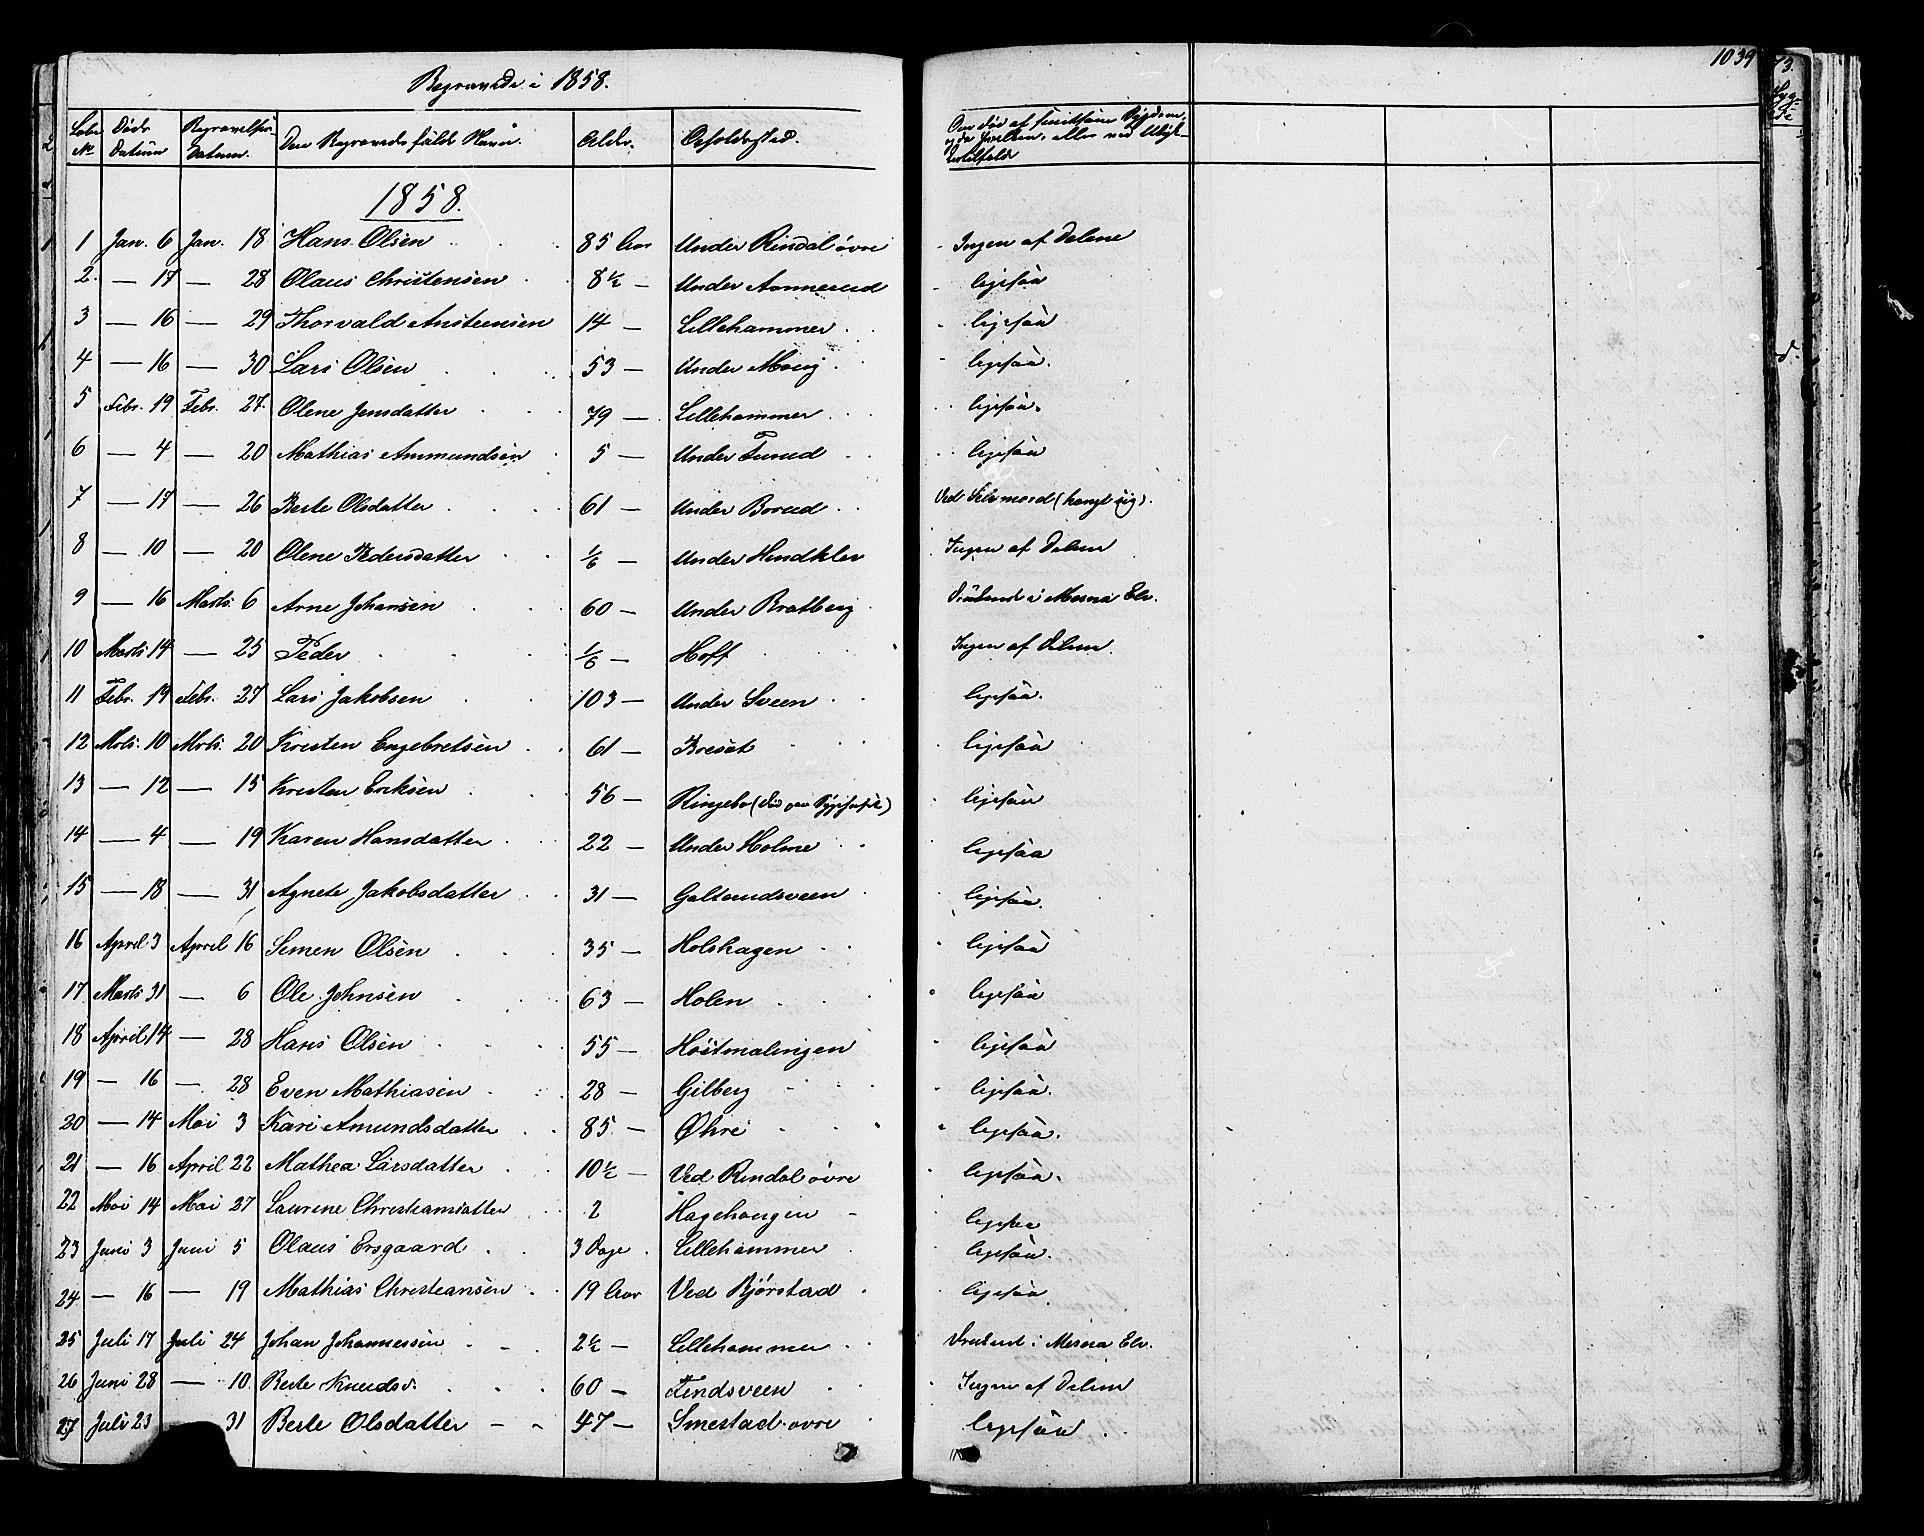 SAH, Fåberg prestekontor, Klokkerbok nr. 7, 1856-1891, s. 1038-1039